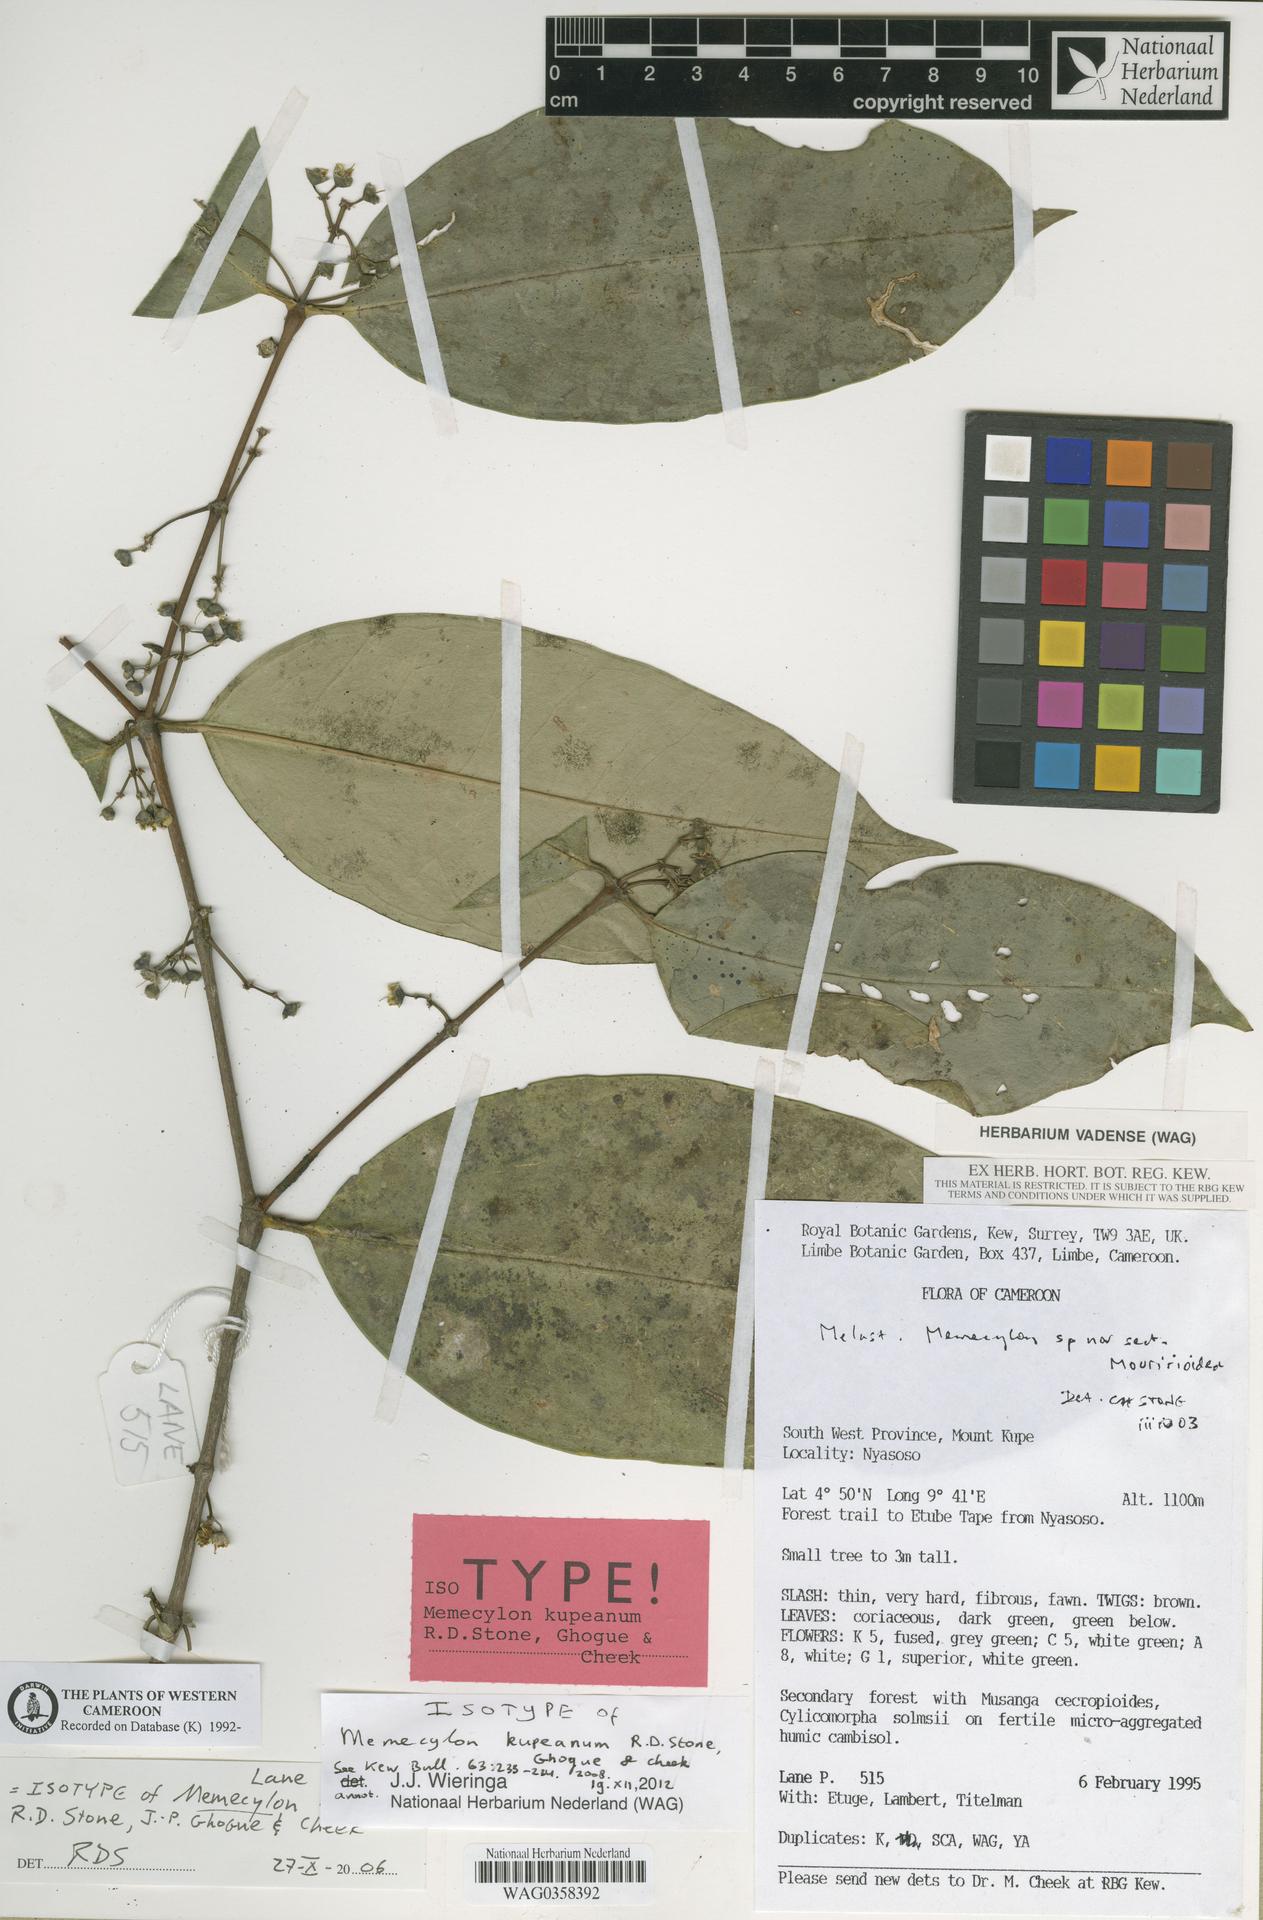 WAG0358392   Memecylon kupeanum R.D.Stone, Ghogue & Cheek